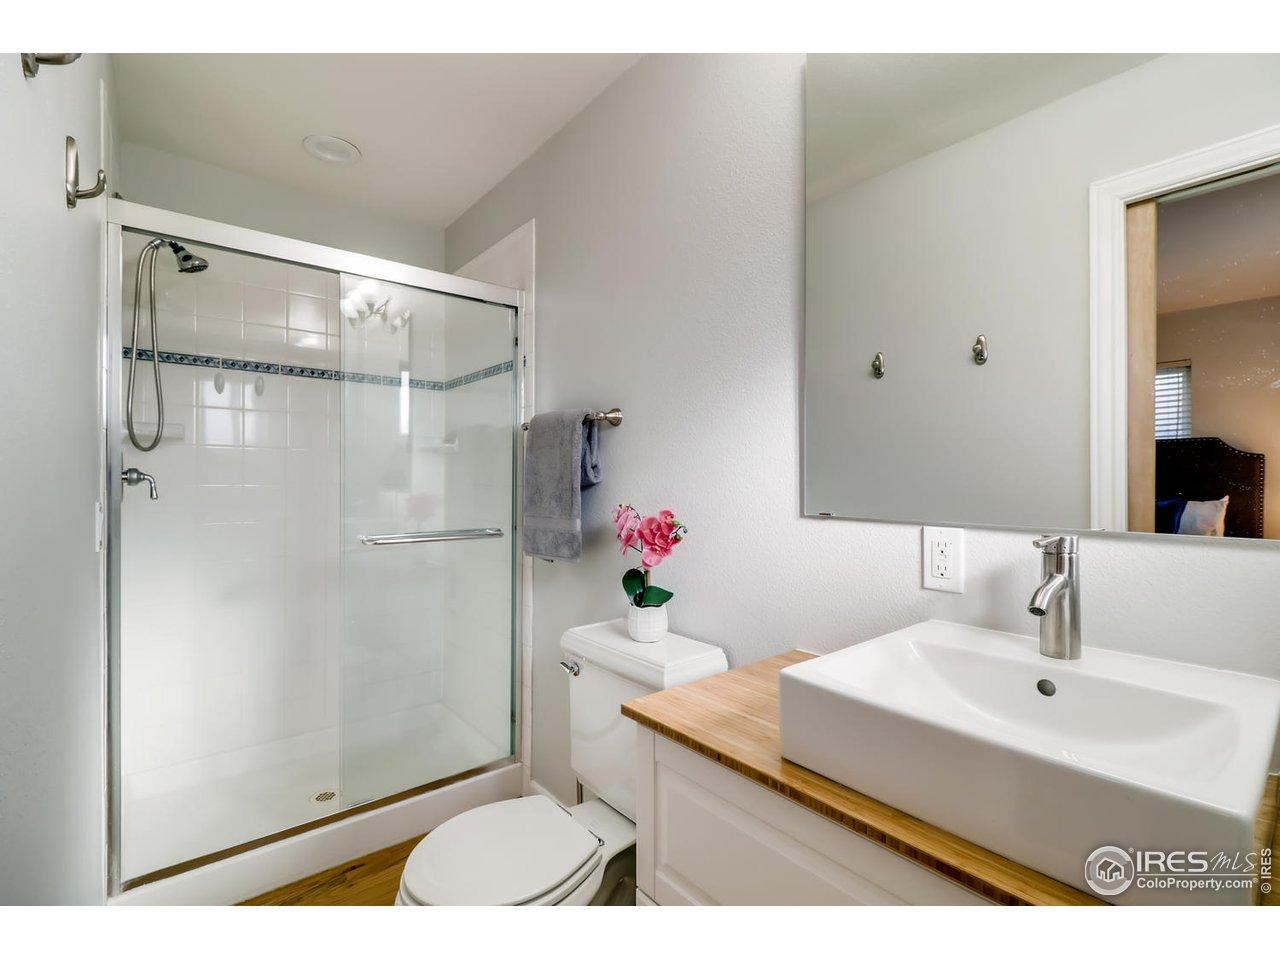 Master bathroom - new vanity